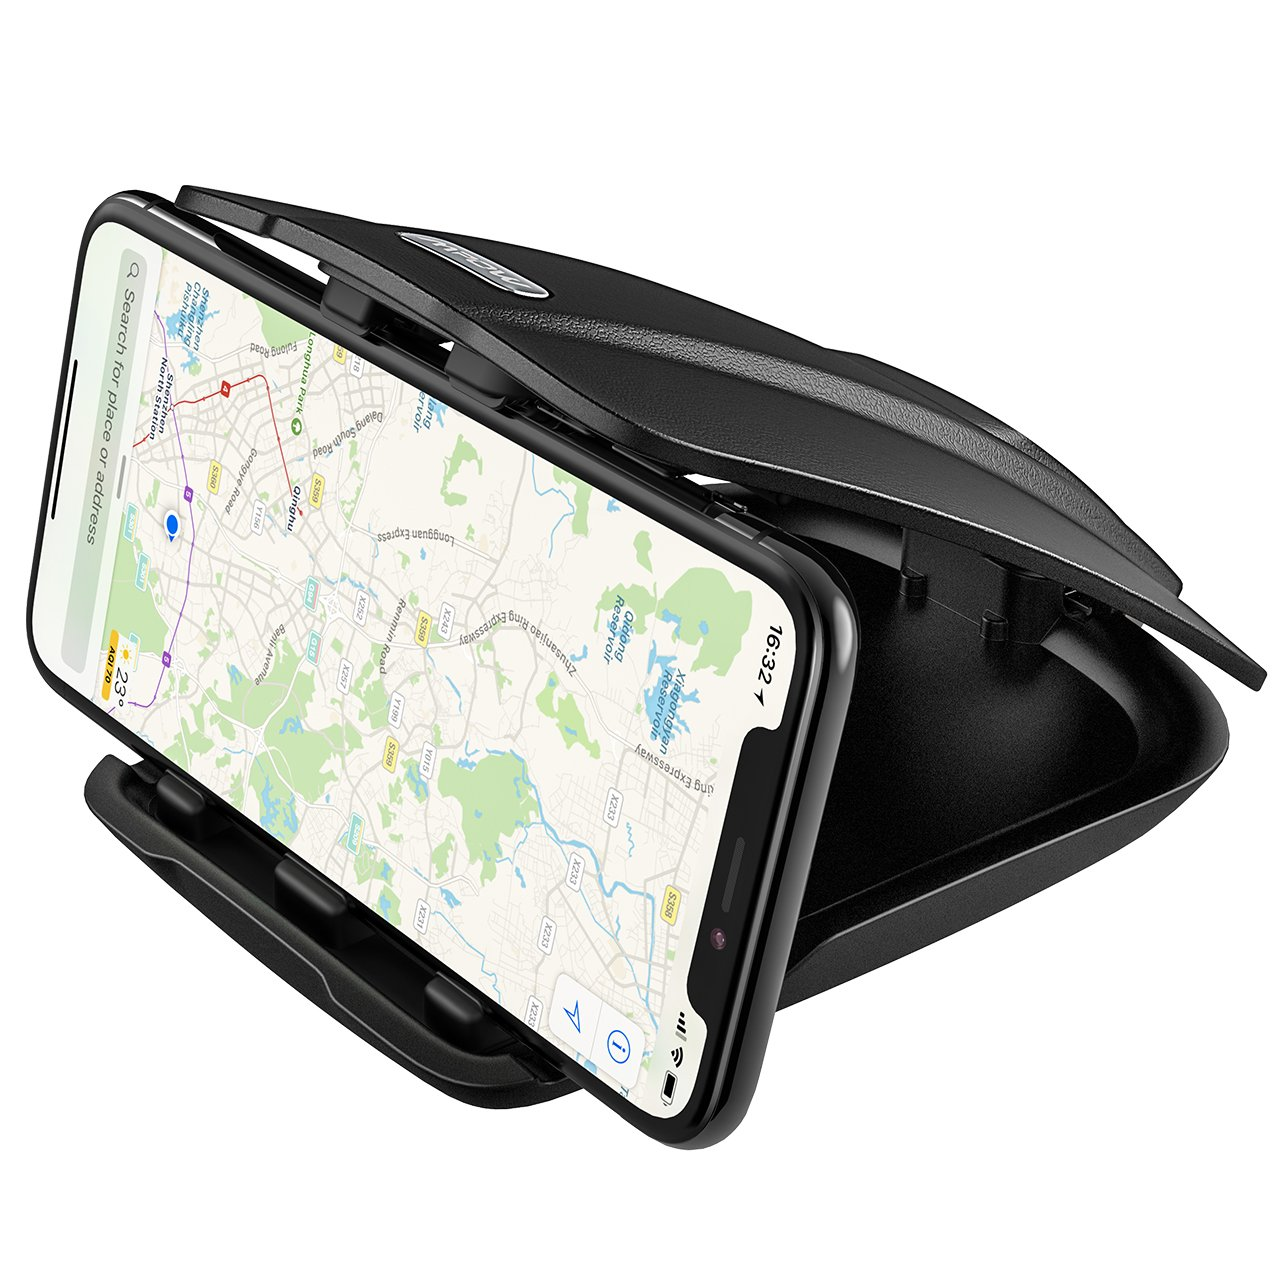 Mpow Soporte Mó vil Coche , Soporte Mó vil para Coche para Salpicadero, Soporte Mó vil Pinza, para iPhone X/ 8 Plus/8/ 7 Plus/ 6 6S Plus, Samsung Galaxy S8,Xiaomi, Navman GPS, etc. Soporte Móvil para Coche para Salpicadero